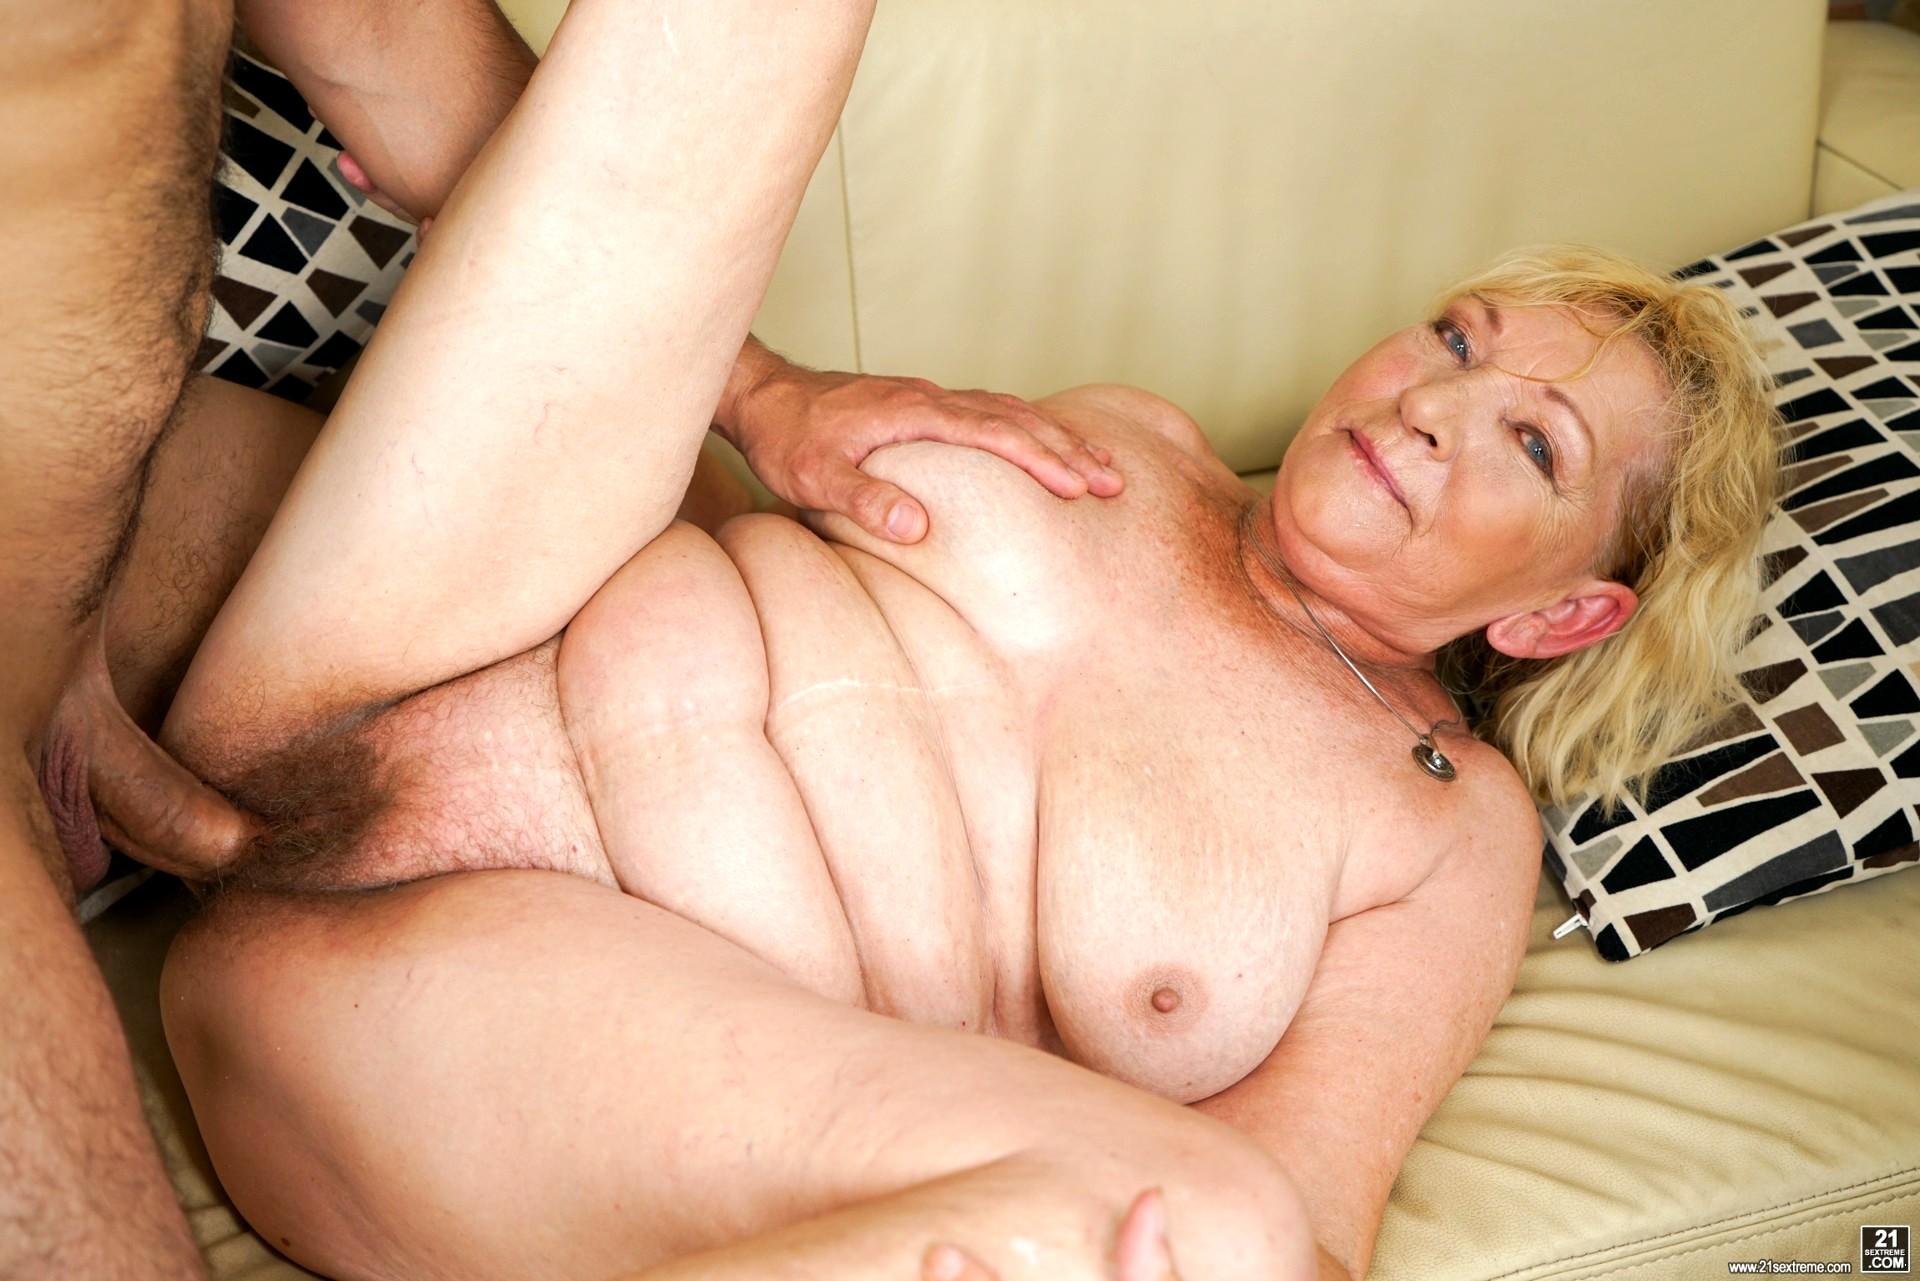 21 Sextreme Alla Hyper Granny Zip Sex Hd Pics-9822